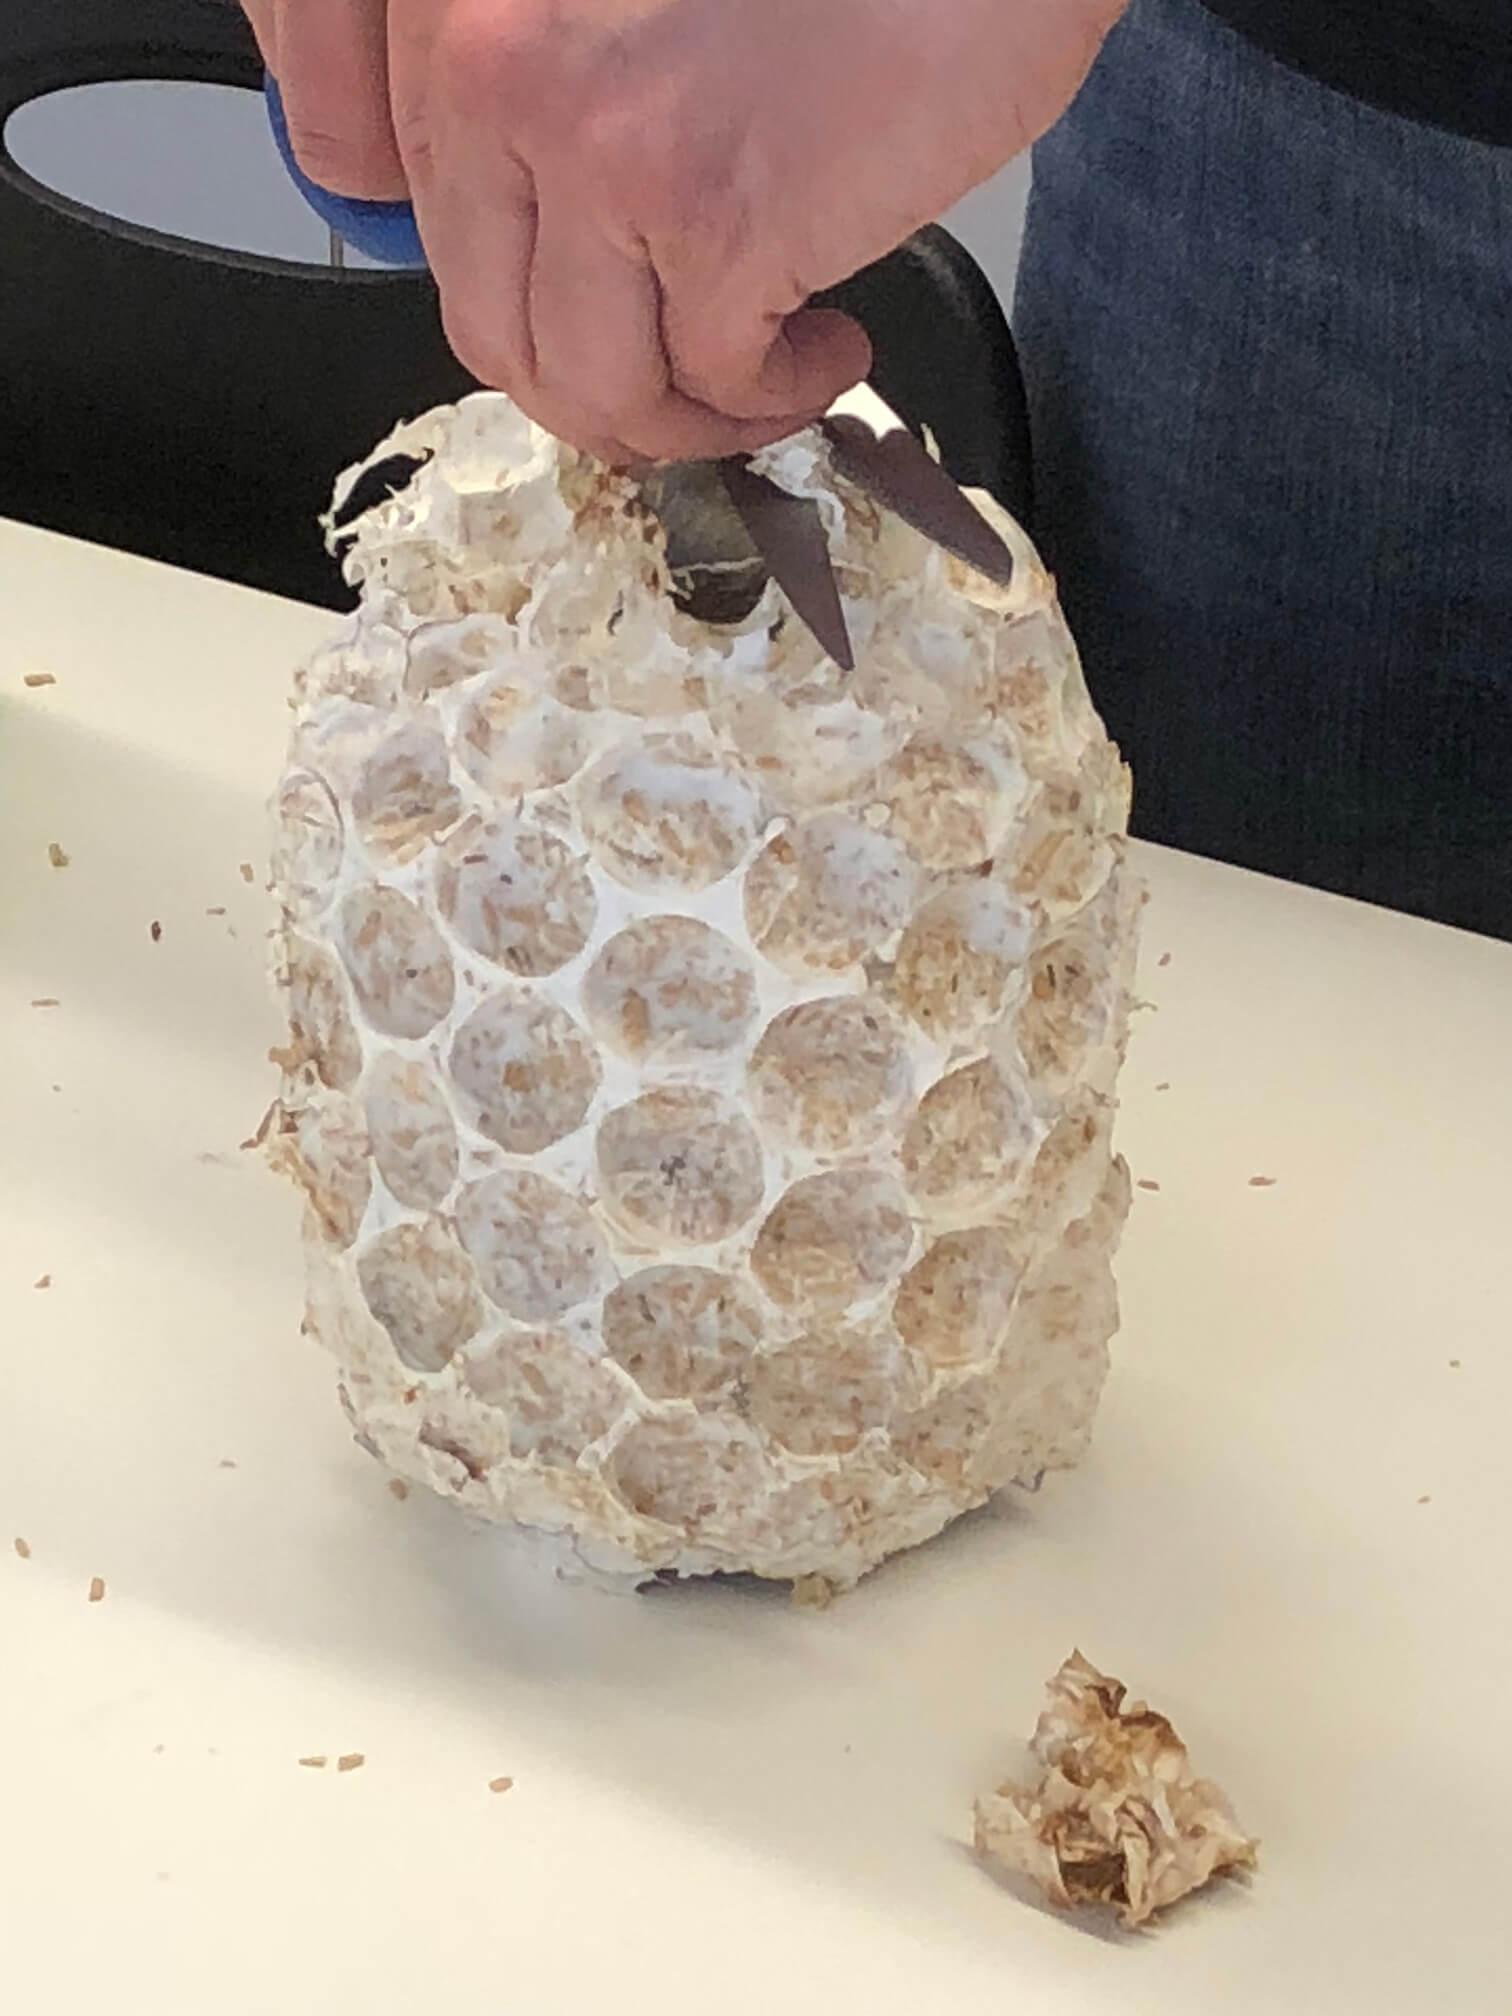 Mycelium lampshades being unmolded